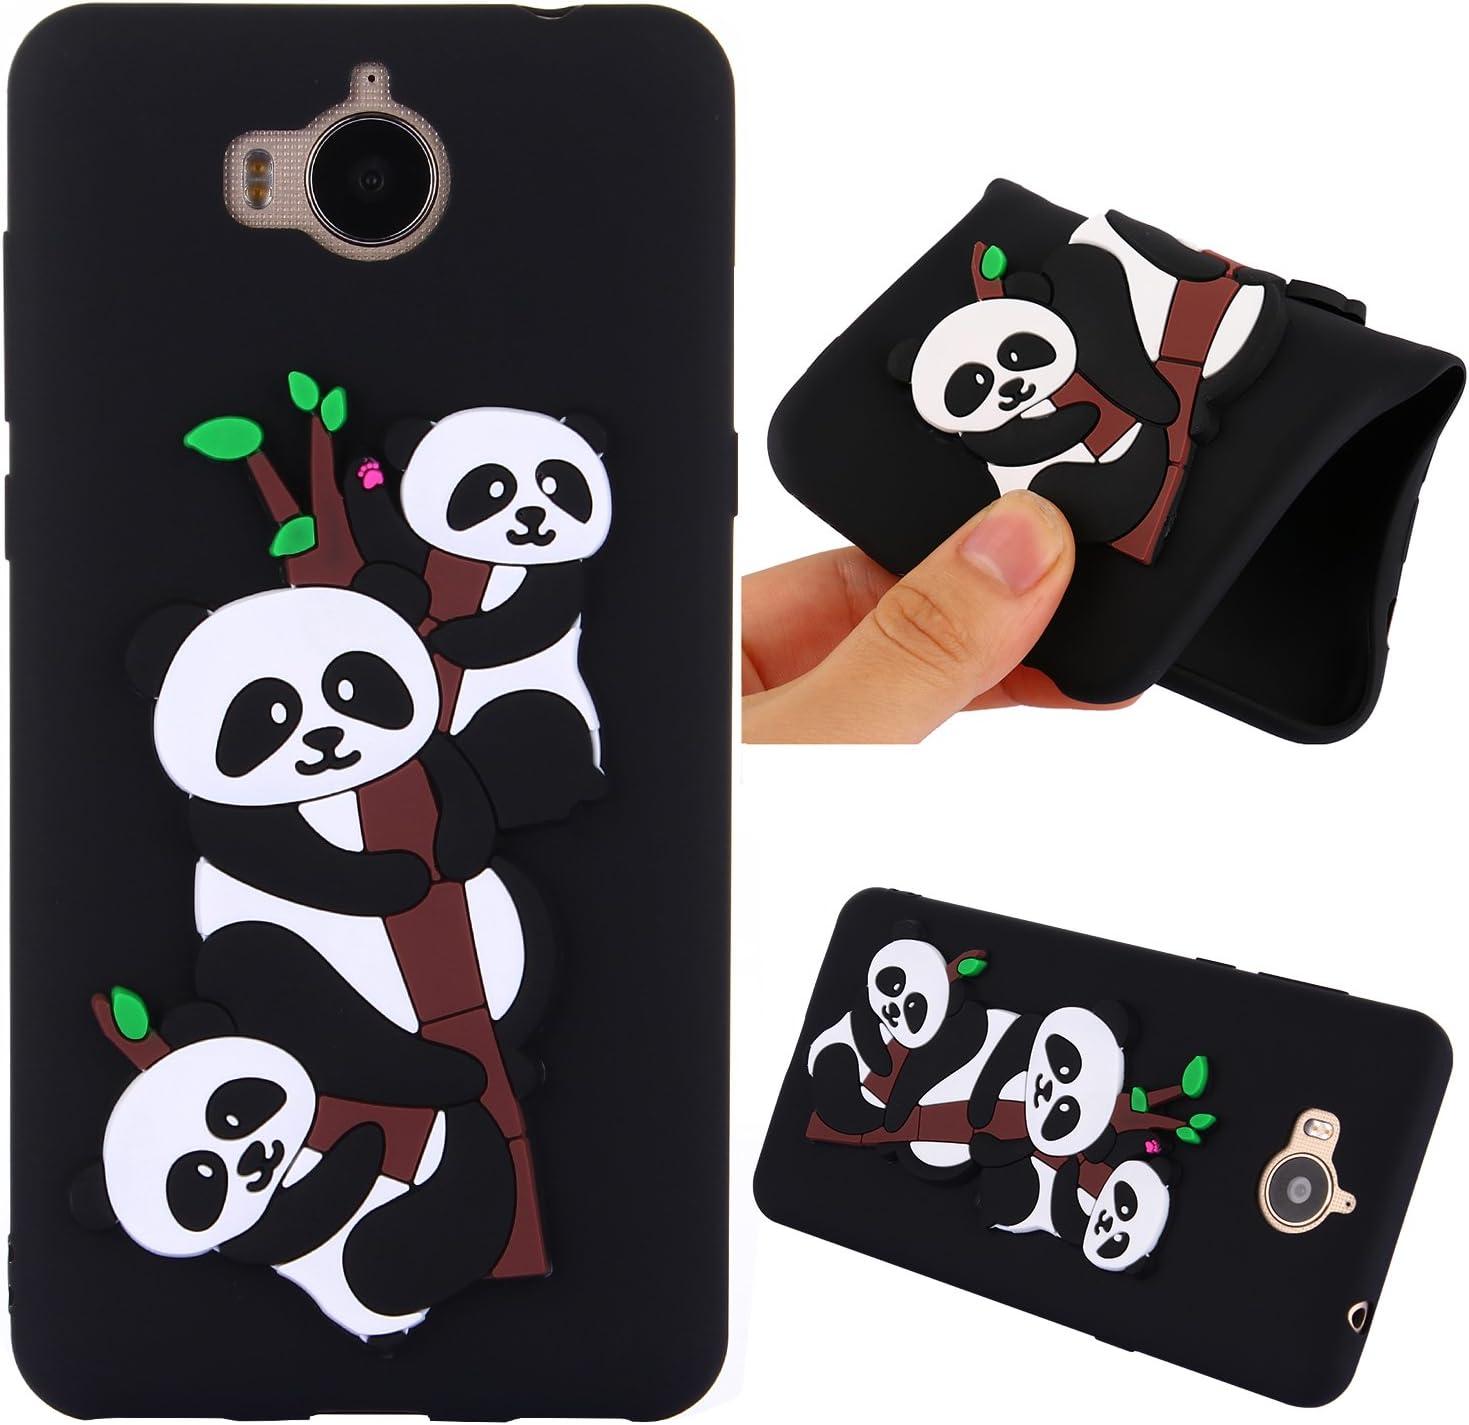 MoEvn Custodia Huawei Nova Young Cover, 3D Panda Protettiva Case in TPU Silicone per Huawei Y5 2017 / Huawei Nova Young Smartphone Ultra Sottile ...